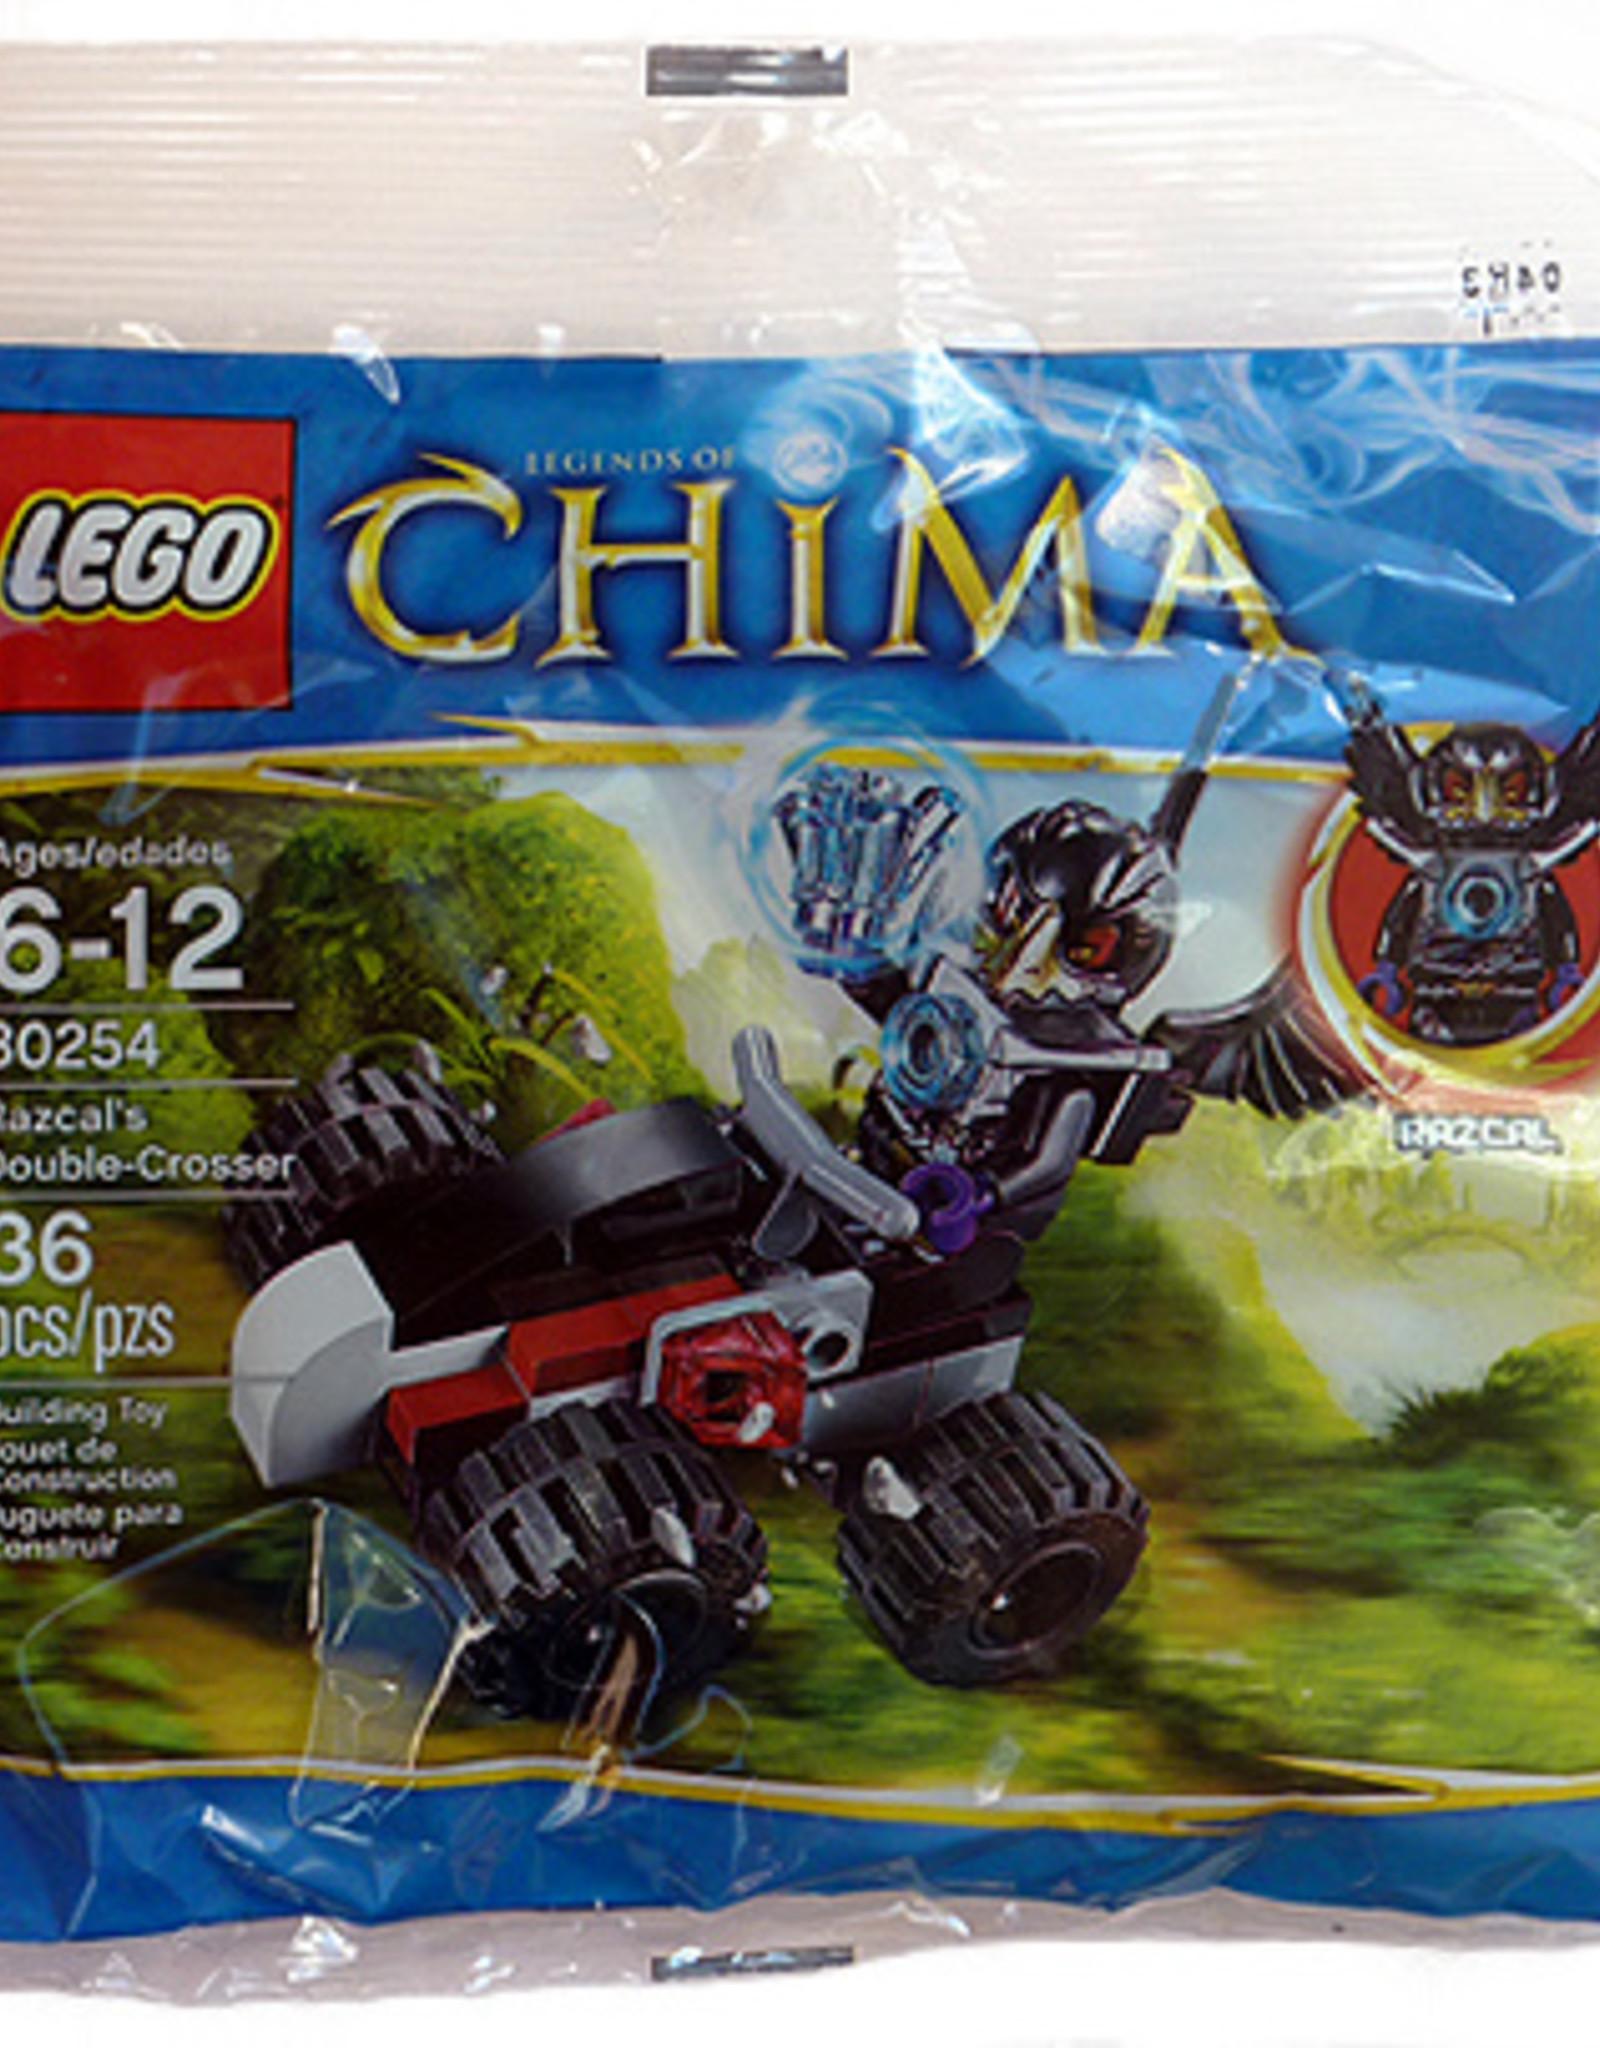 LEGO LEGO 30254 Razcal's Double Crosser CHIMA